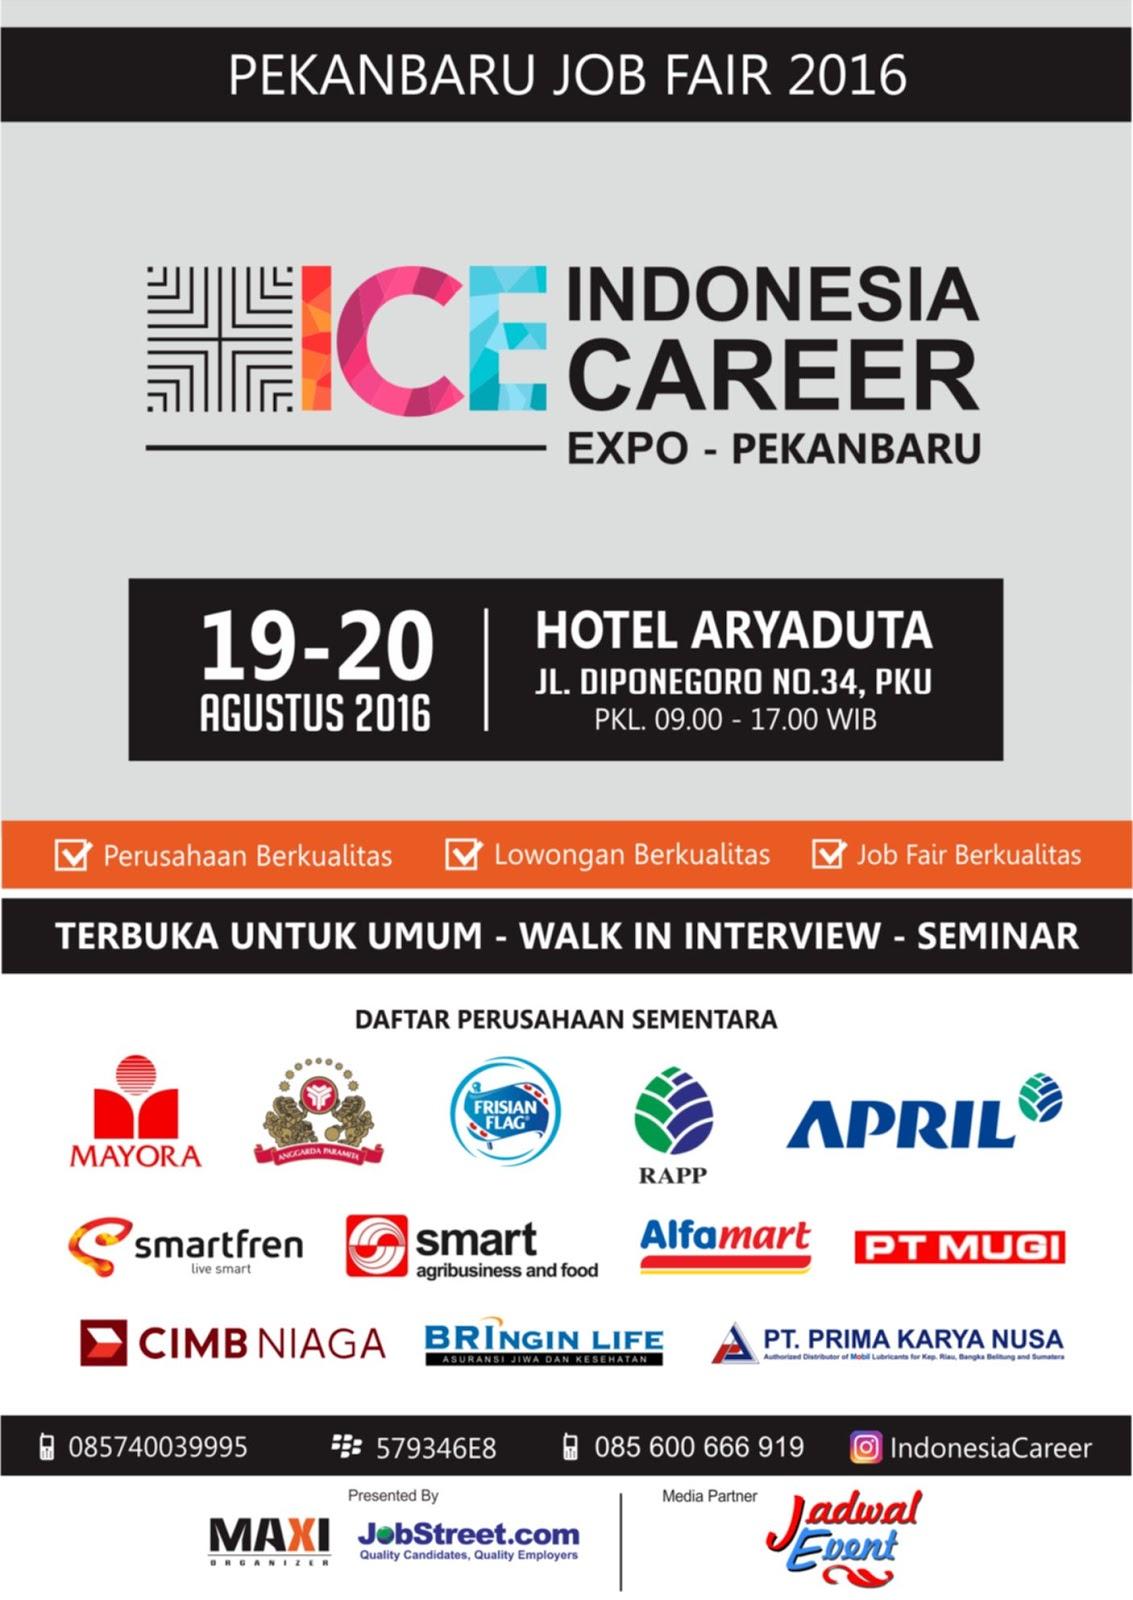 job fair pekanbaru career expo jadwal event job fair pekanbaru career expo 2016